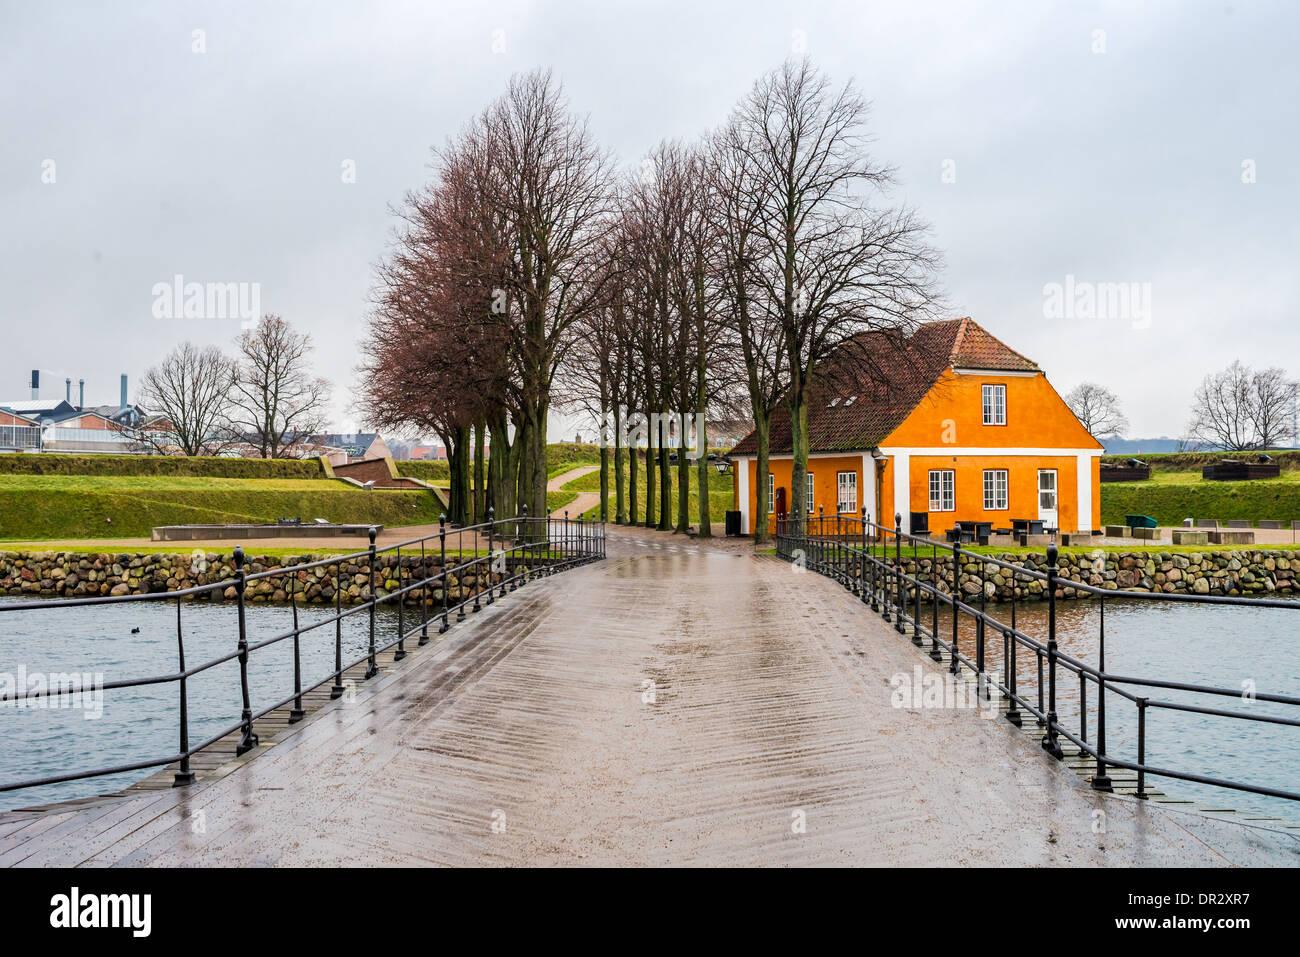 The entrance of Danish castle Kronborg in Helsingor - Stock Image